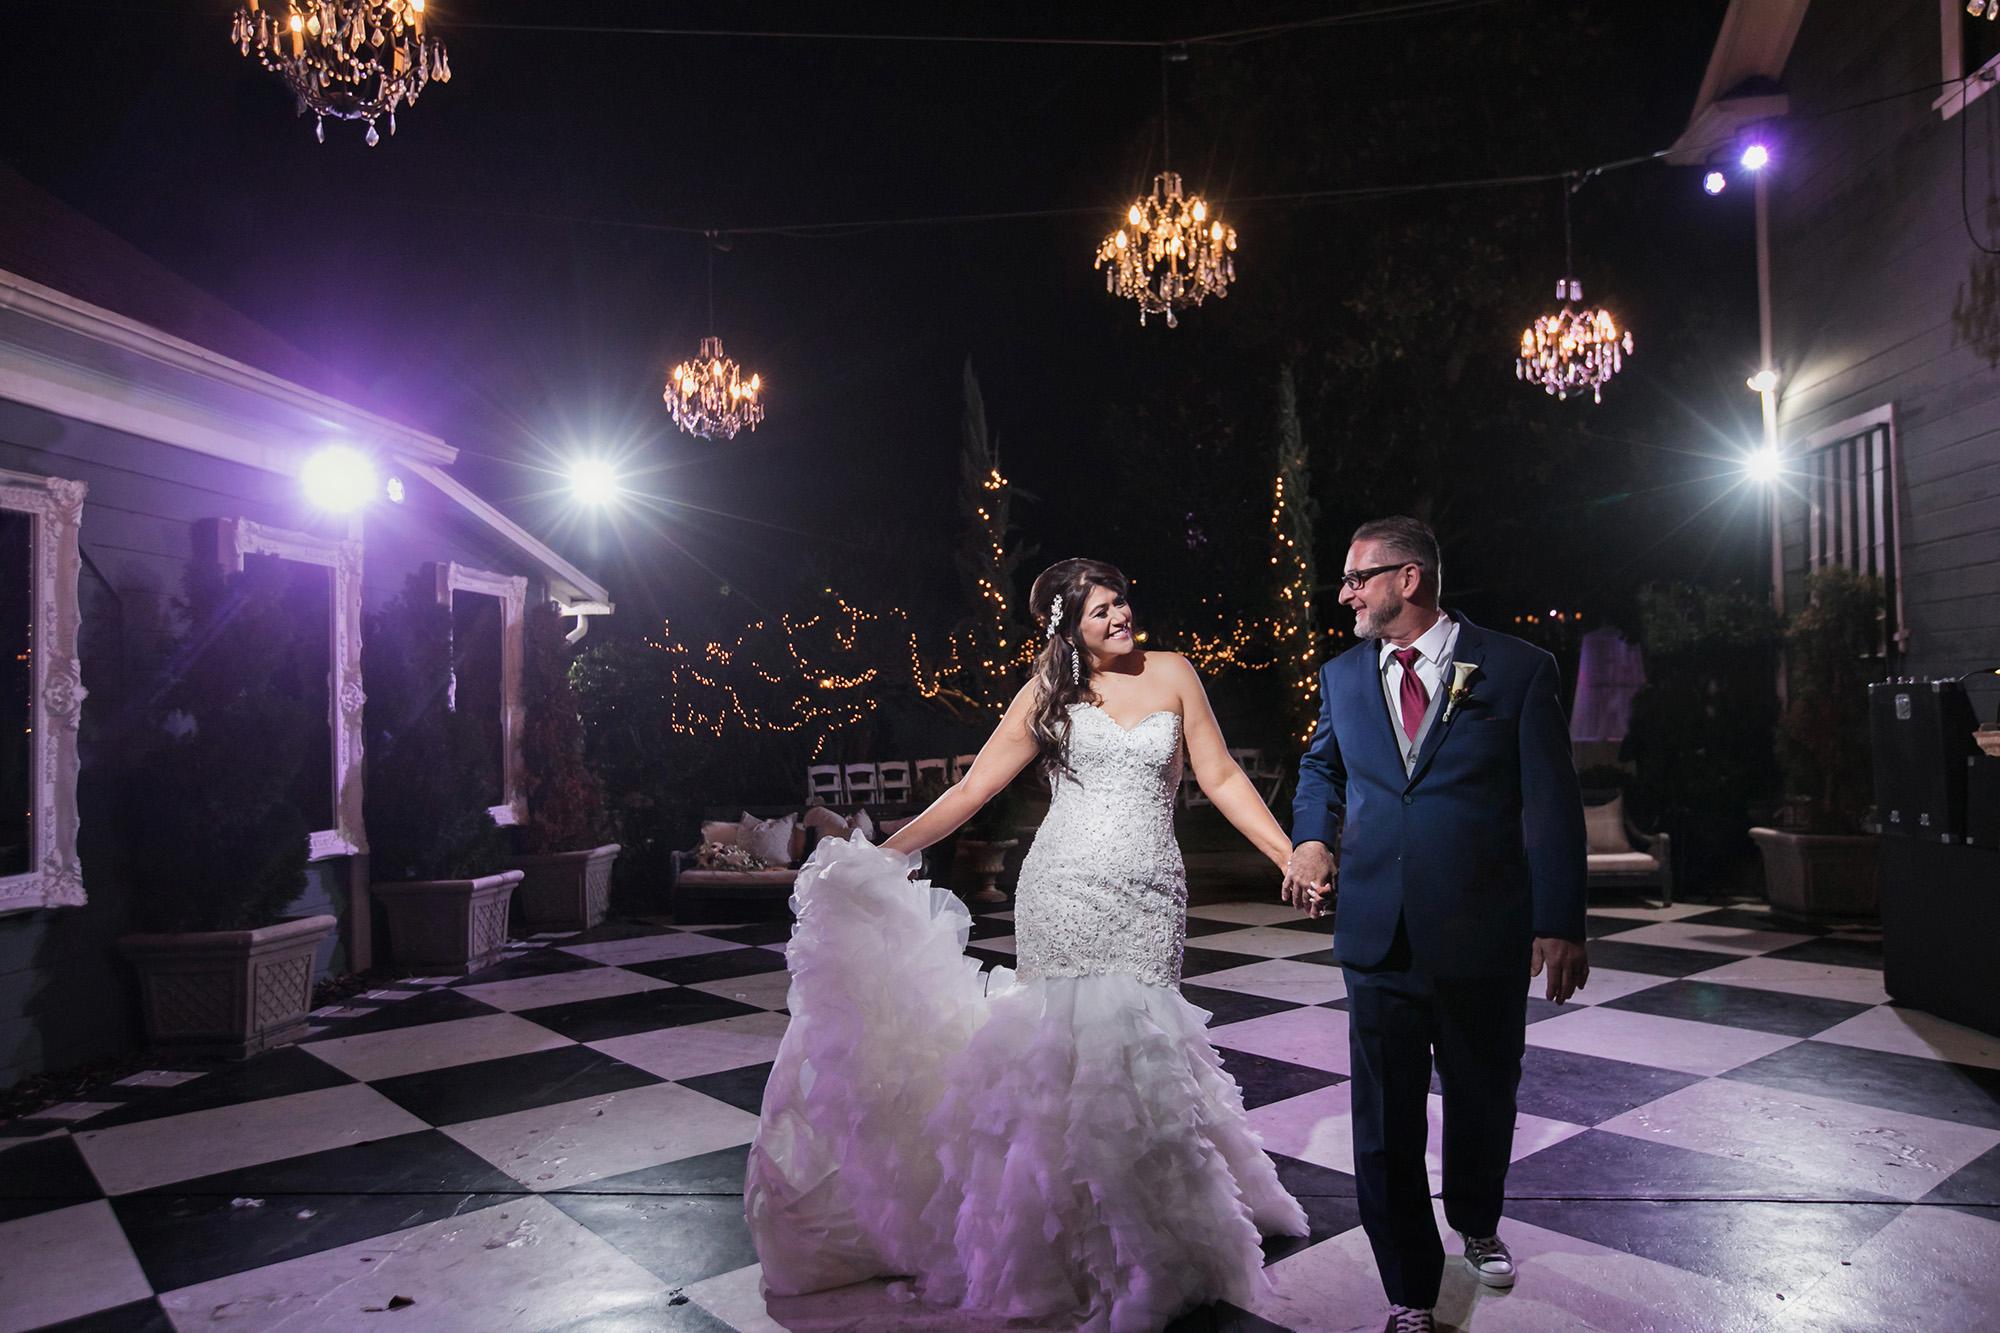 christmas-house-weddings-receptions-carrie-vines-172.jpg